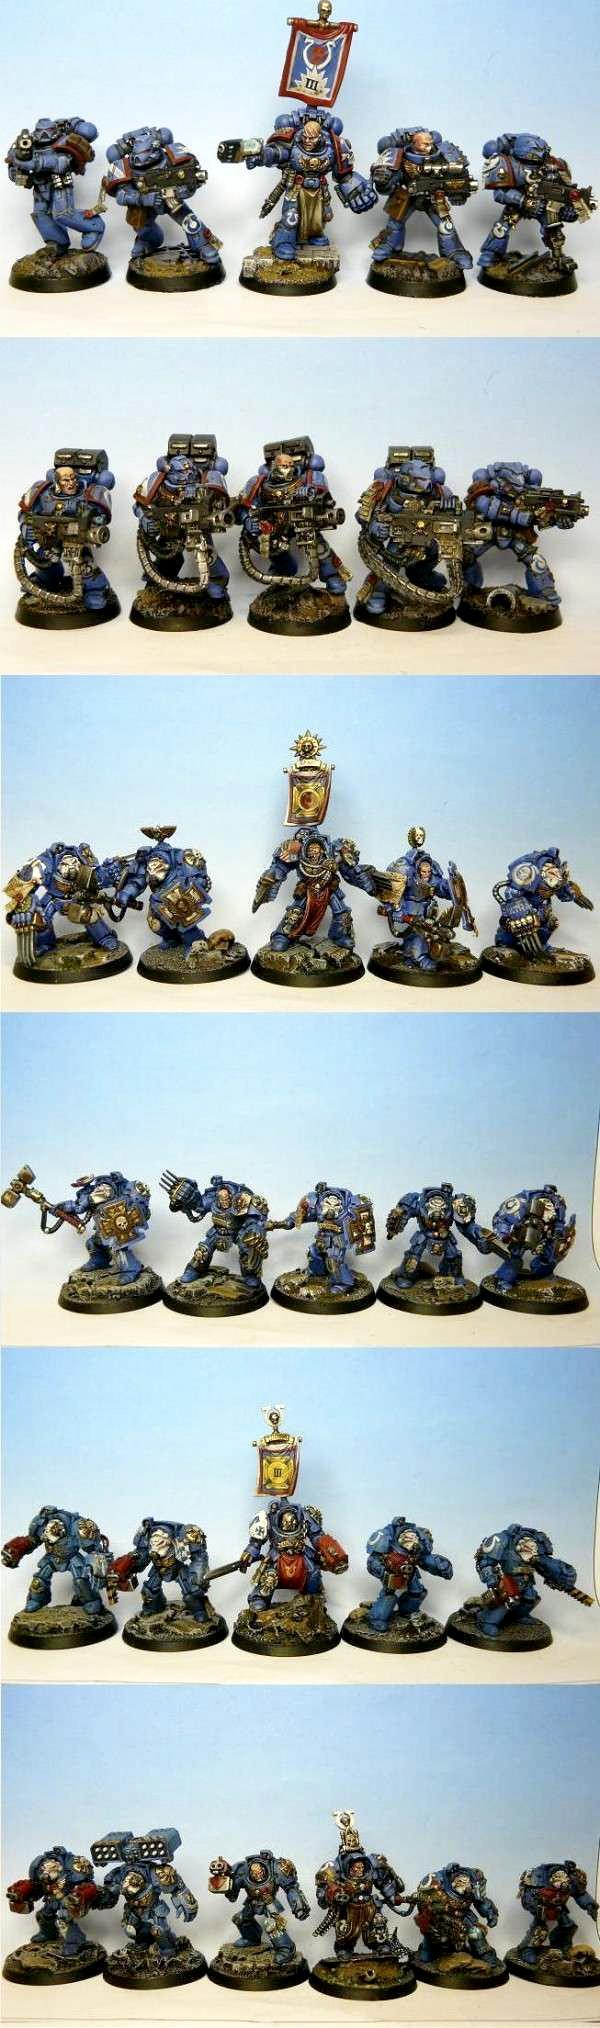 Ultramarines Army part